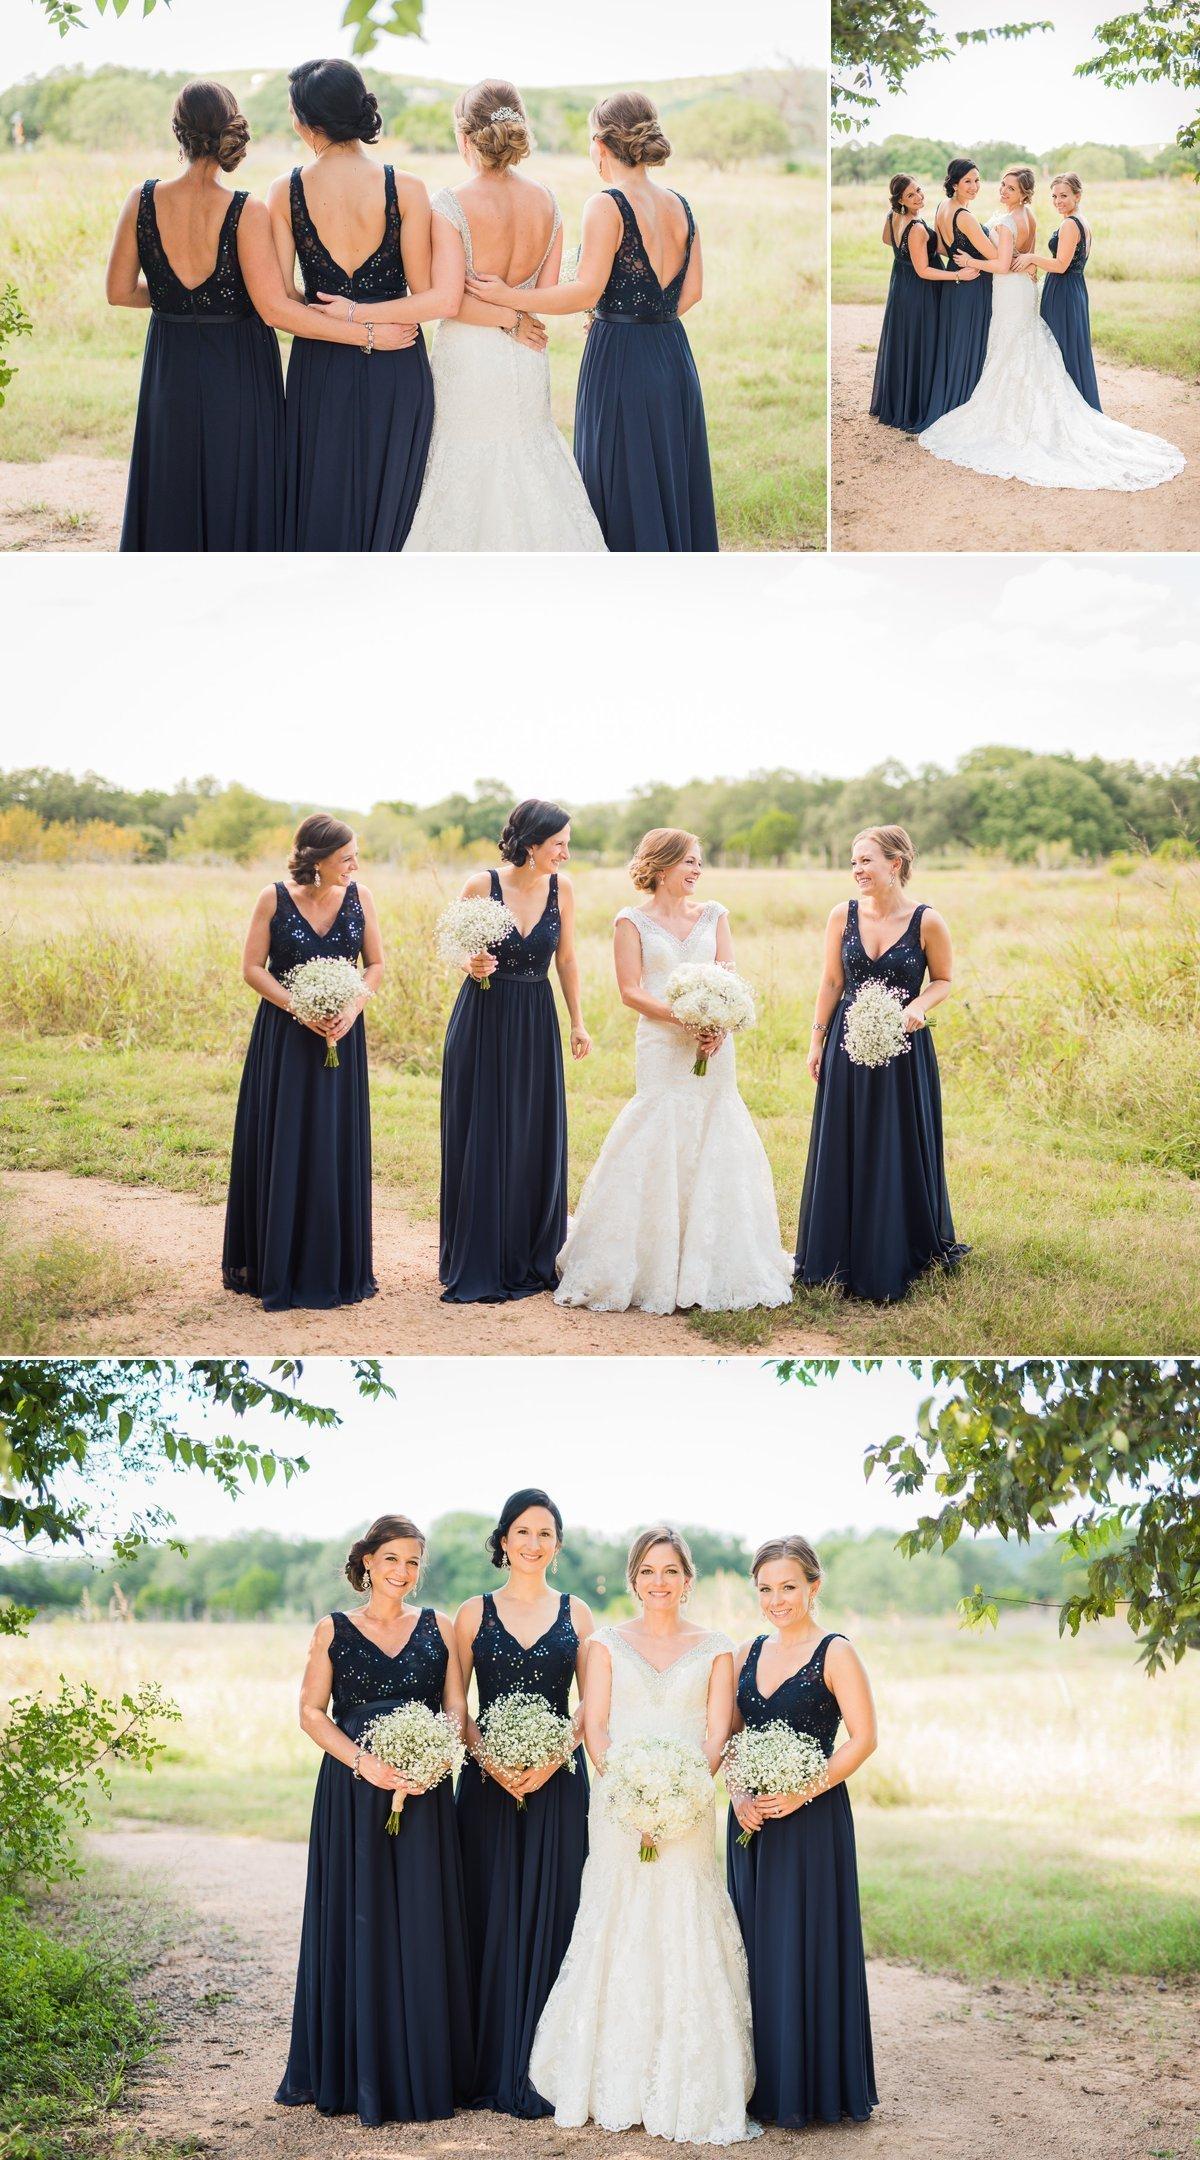 Montesino Ranch Wedding Bride and Bridesmaids